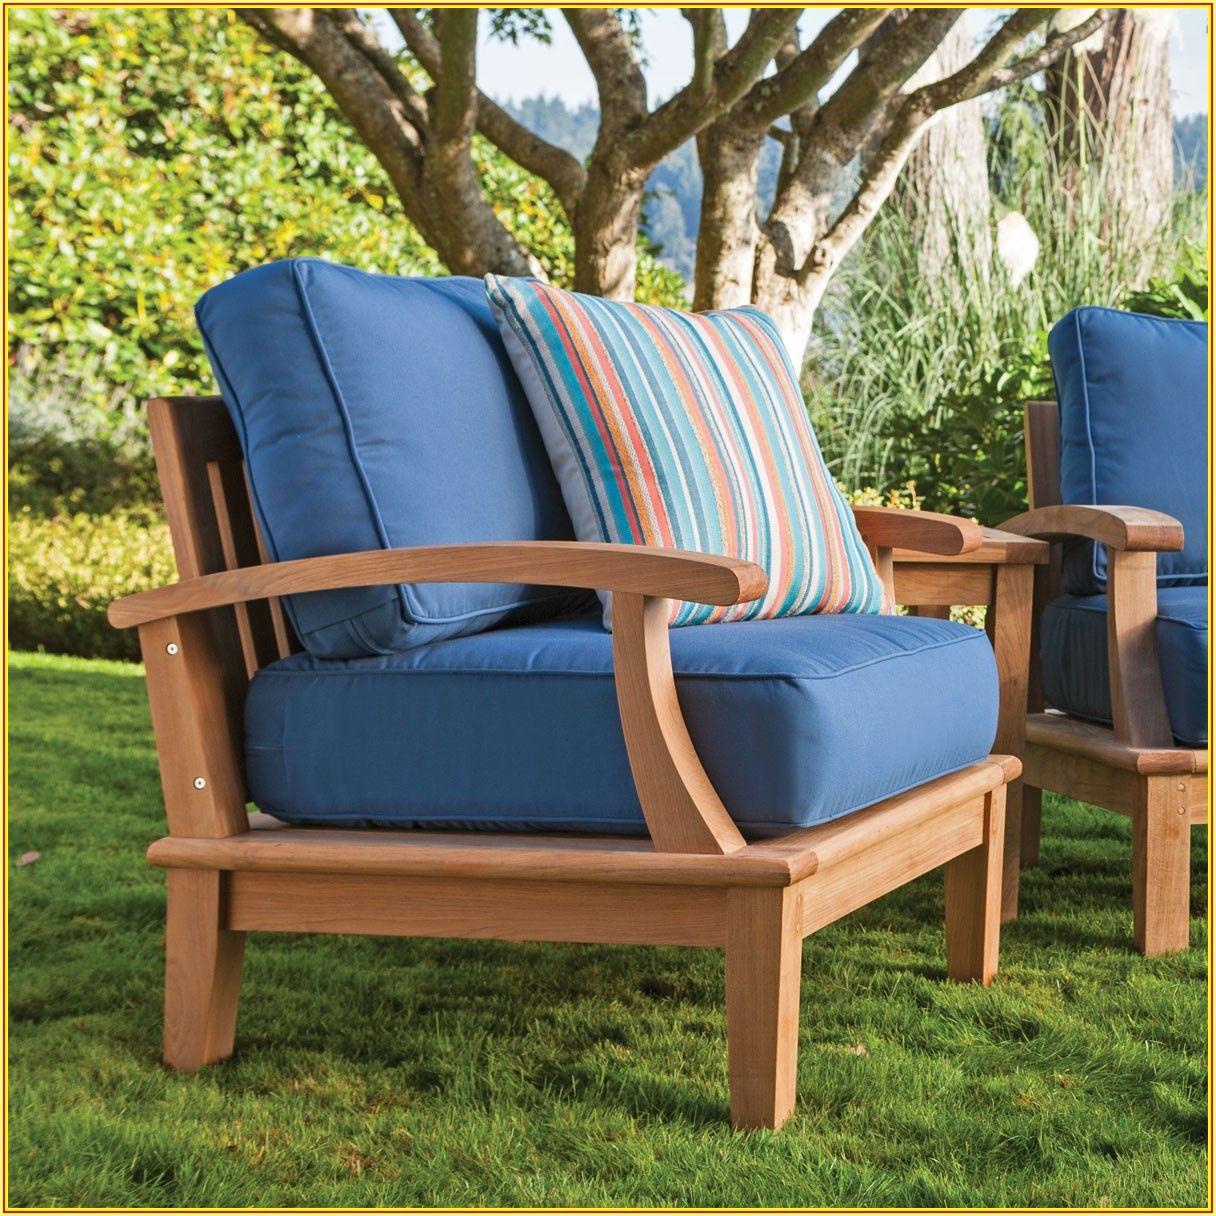 Patio Furniture With Sunbrella Cushions